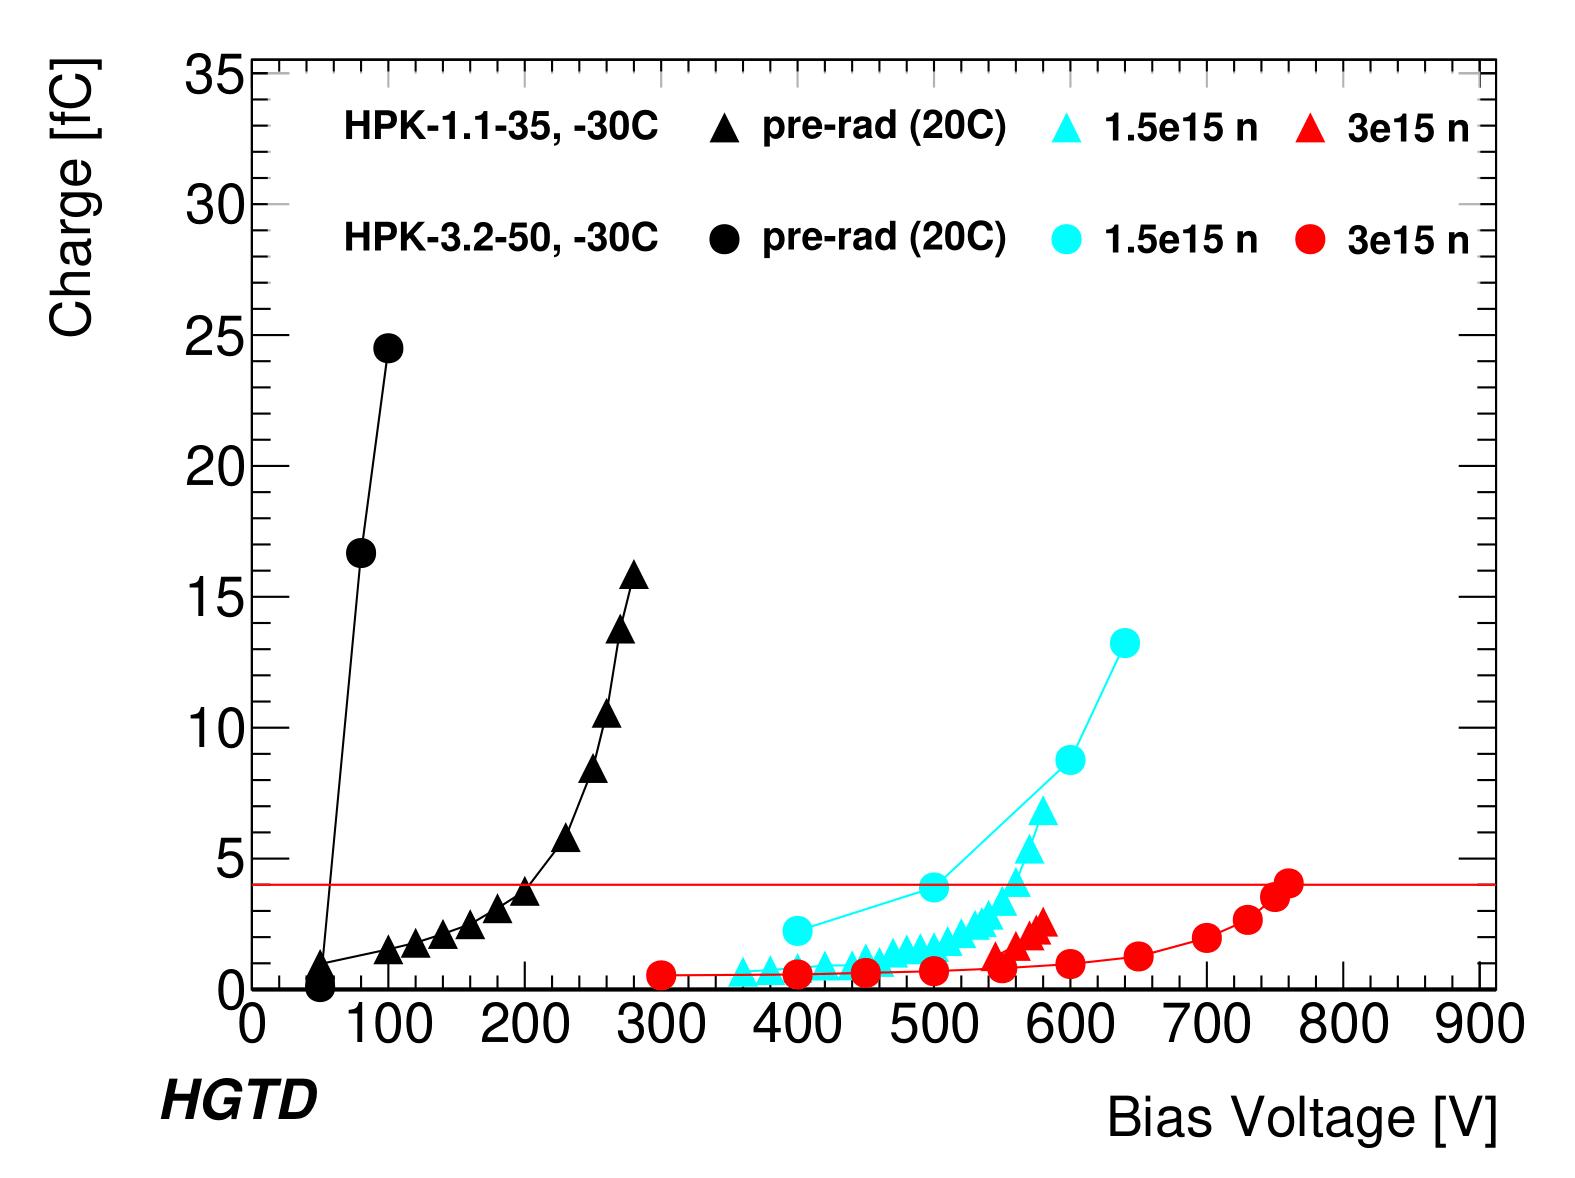 Plot_HPK12_bias_voltage_vs_charge-1.png